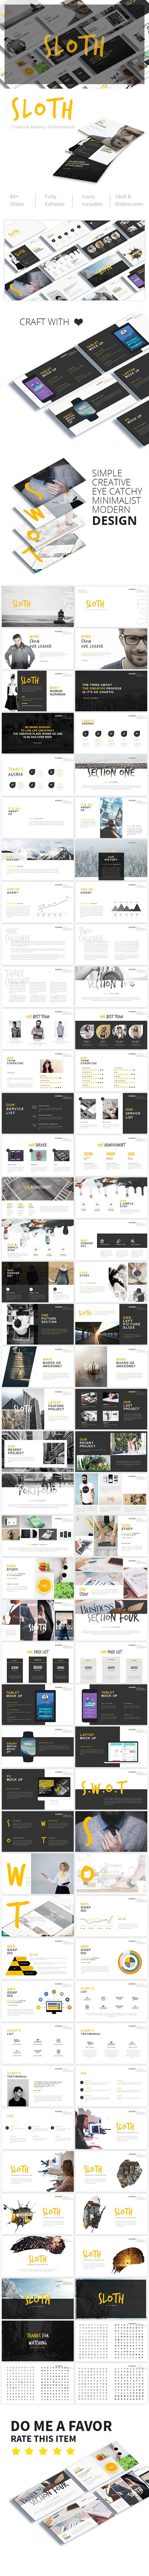 Sloth Creative Agency Keynote Template - Creative Keynote Templates